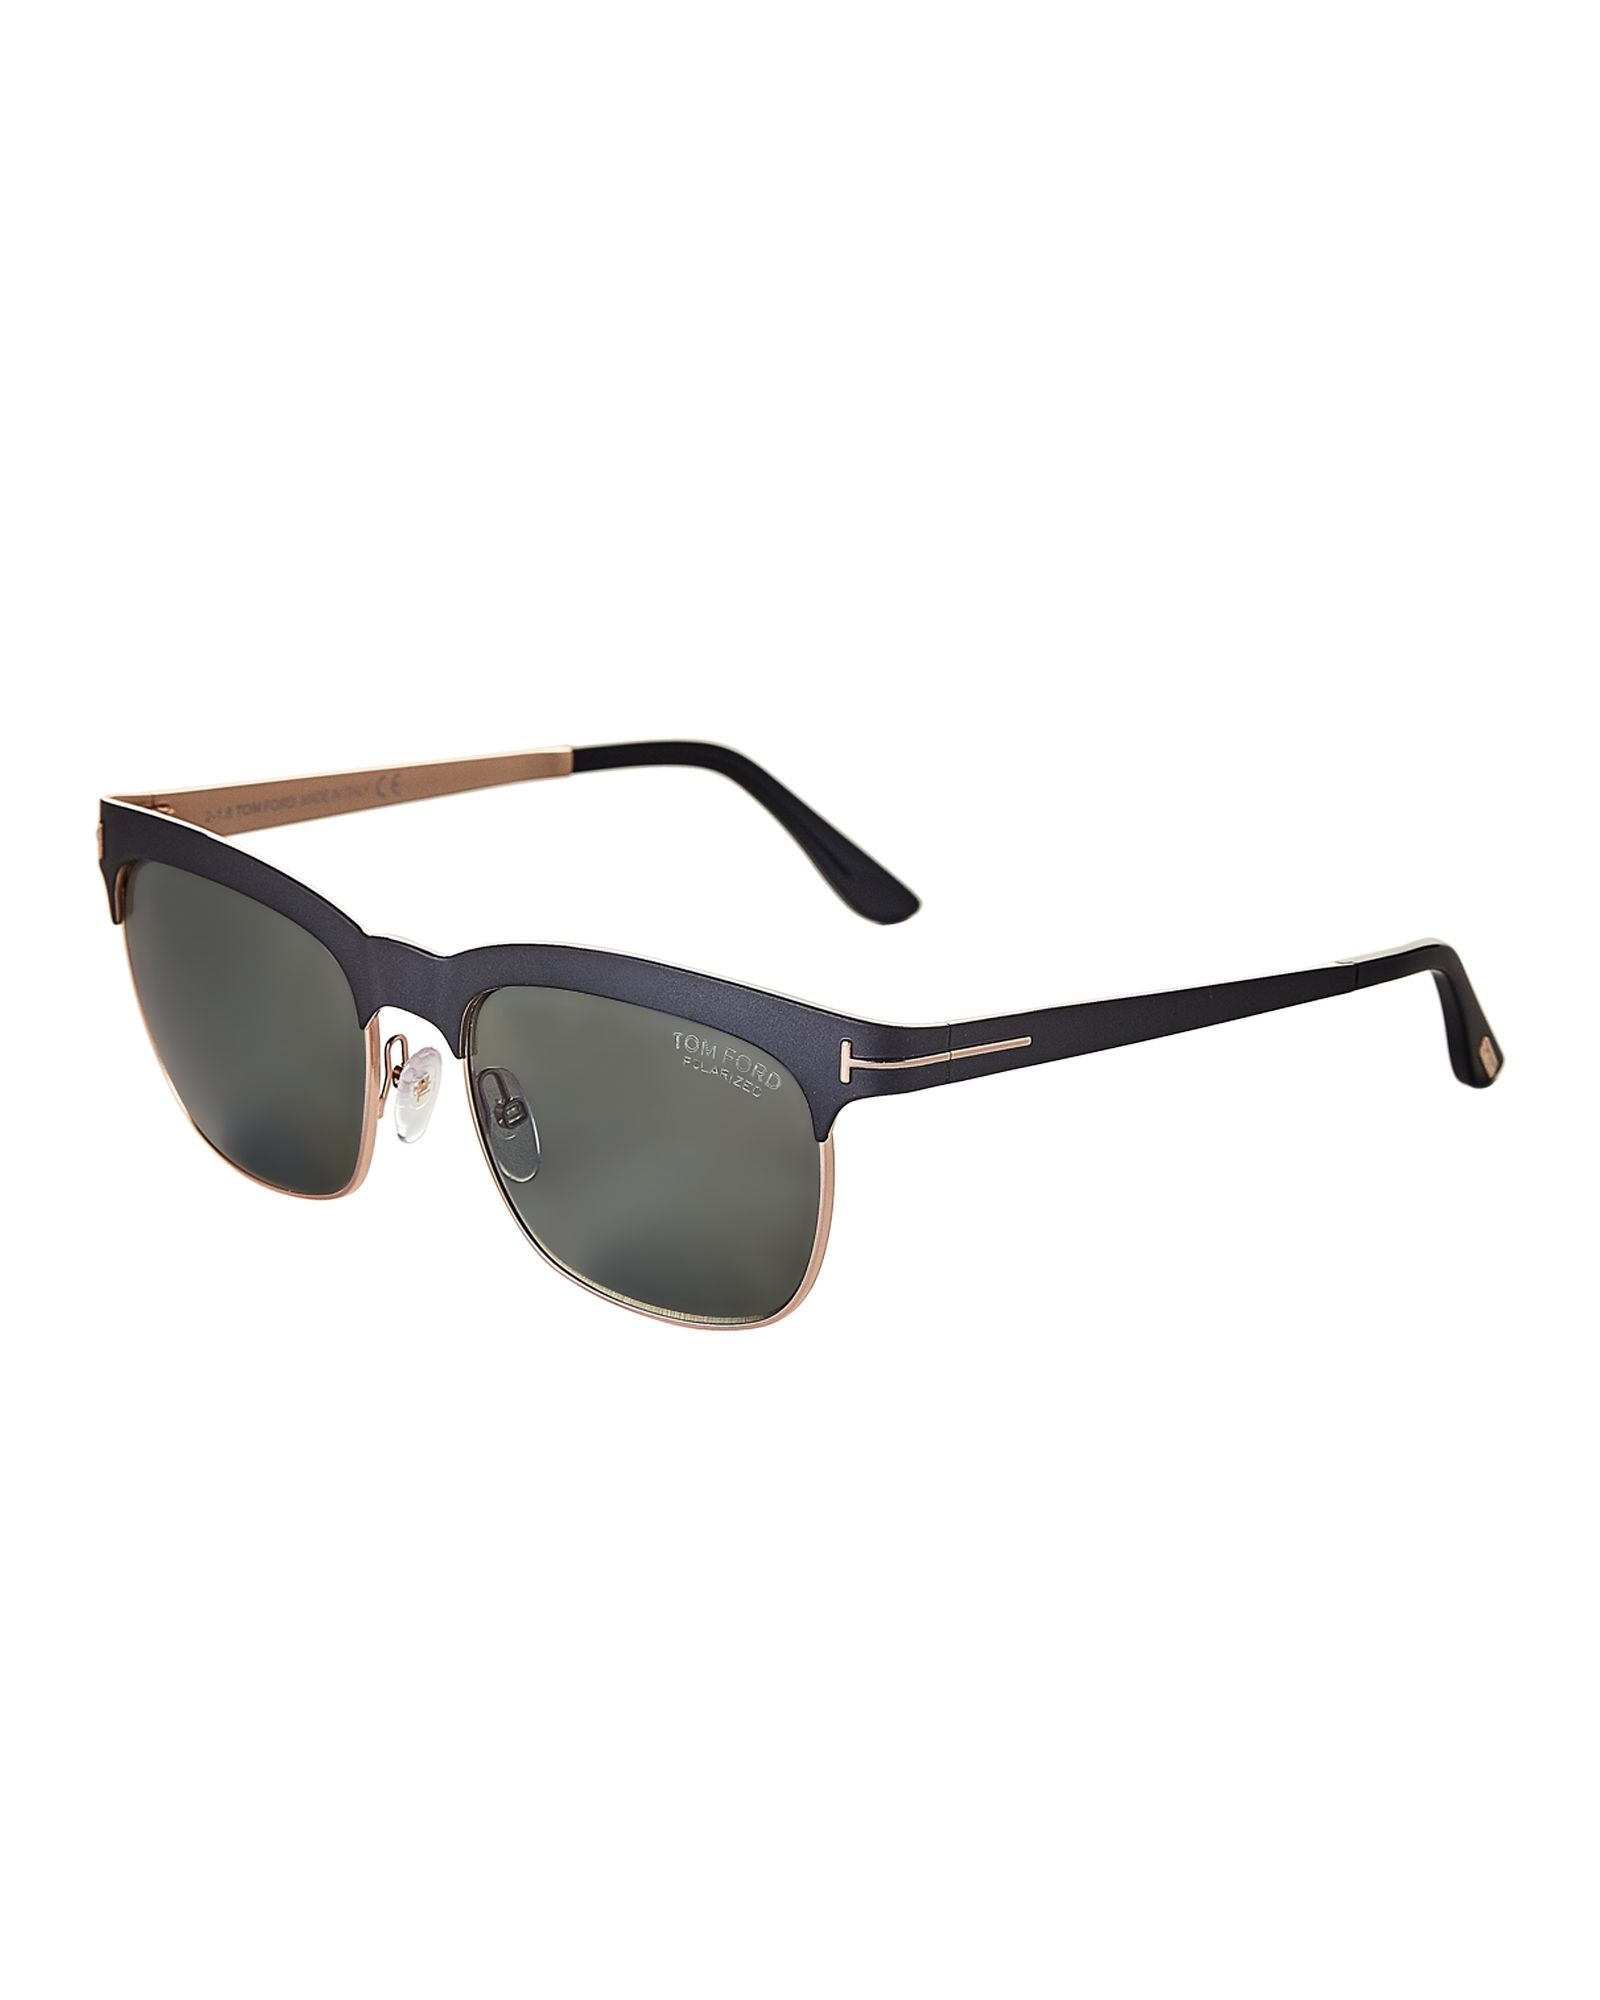 8b7df1997e40e Tom Ford Elena TF437 Matte Black Wayfarer Polarized Sunglasses